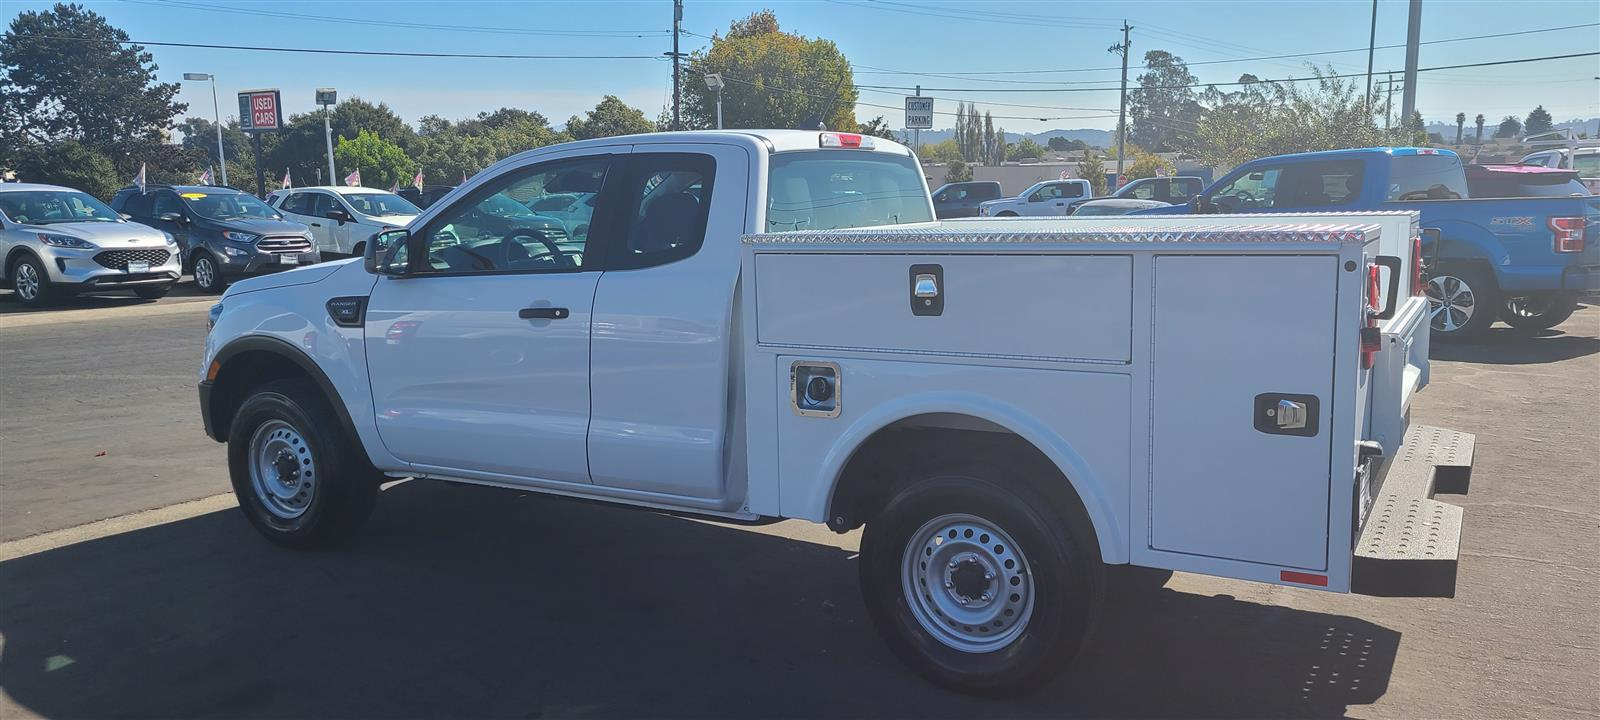 2020 Ford Ranger Super Cab 4x2, ALUMINUM LOW PROFILE SERVICE BODY #wf1027 - photo 1